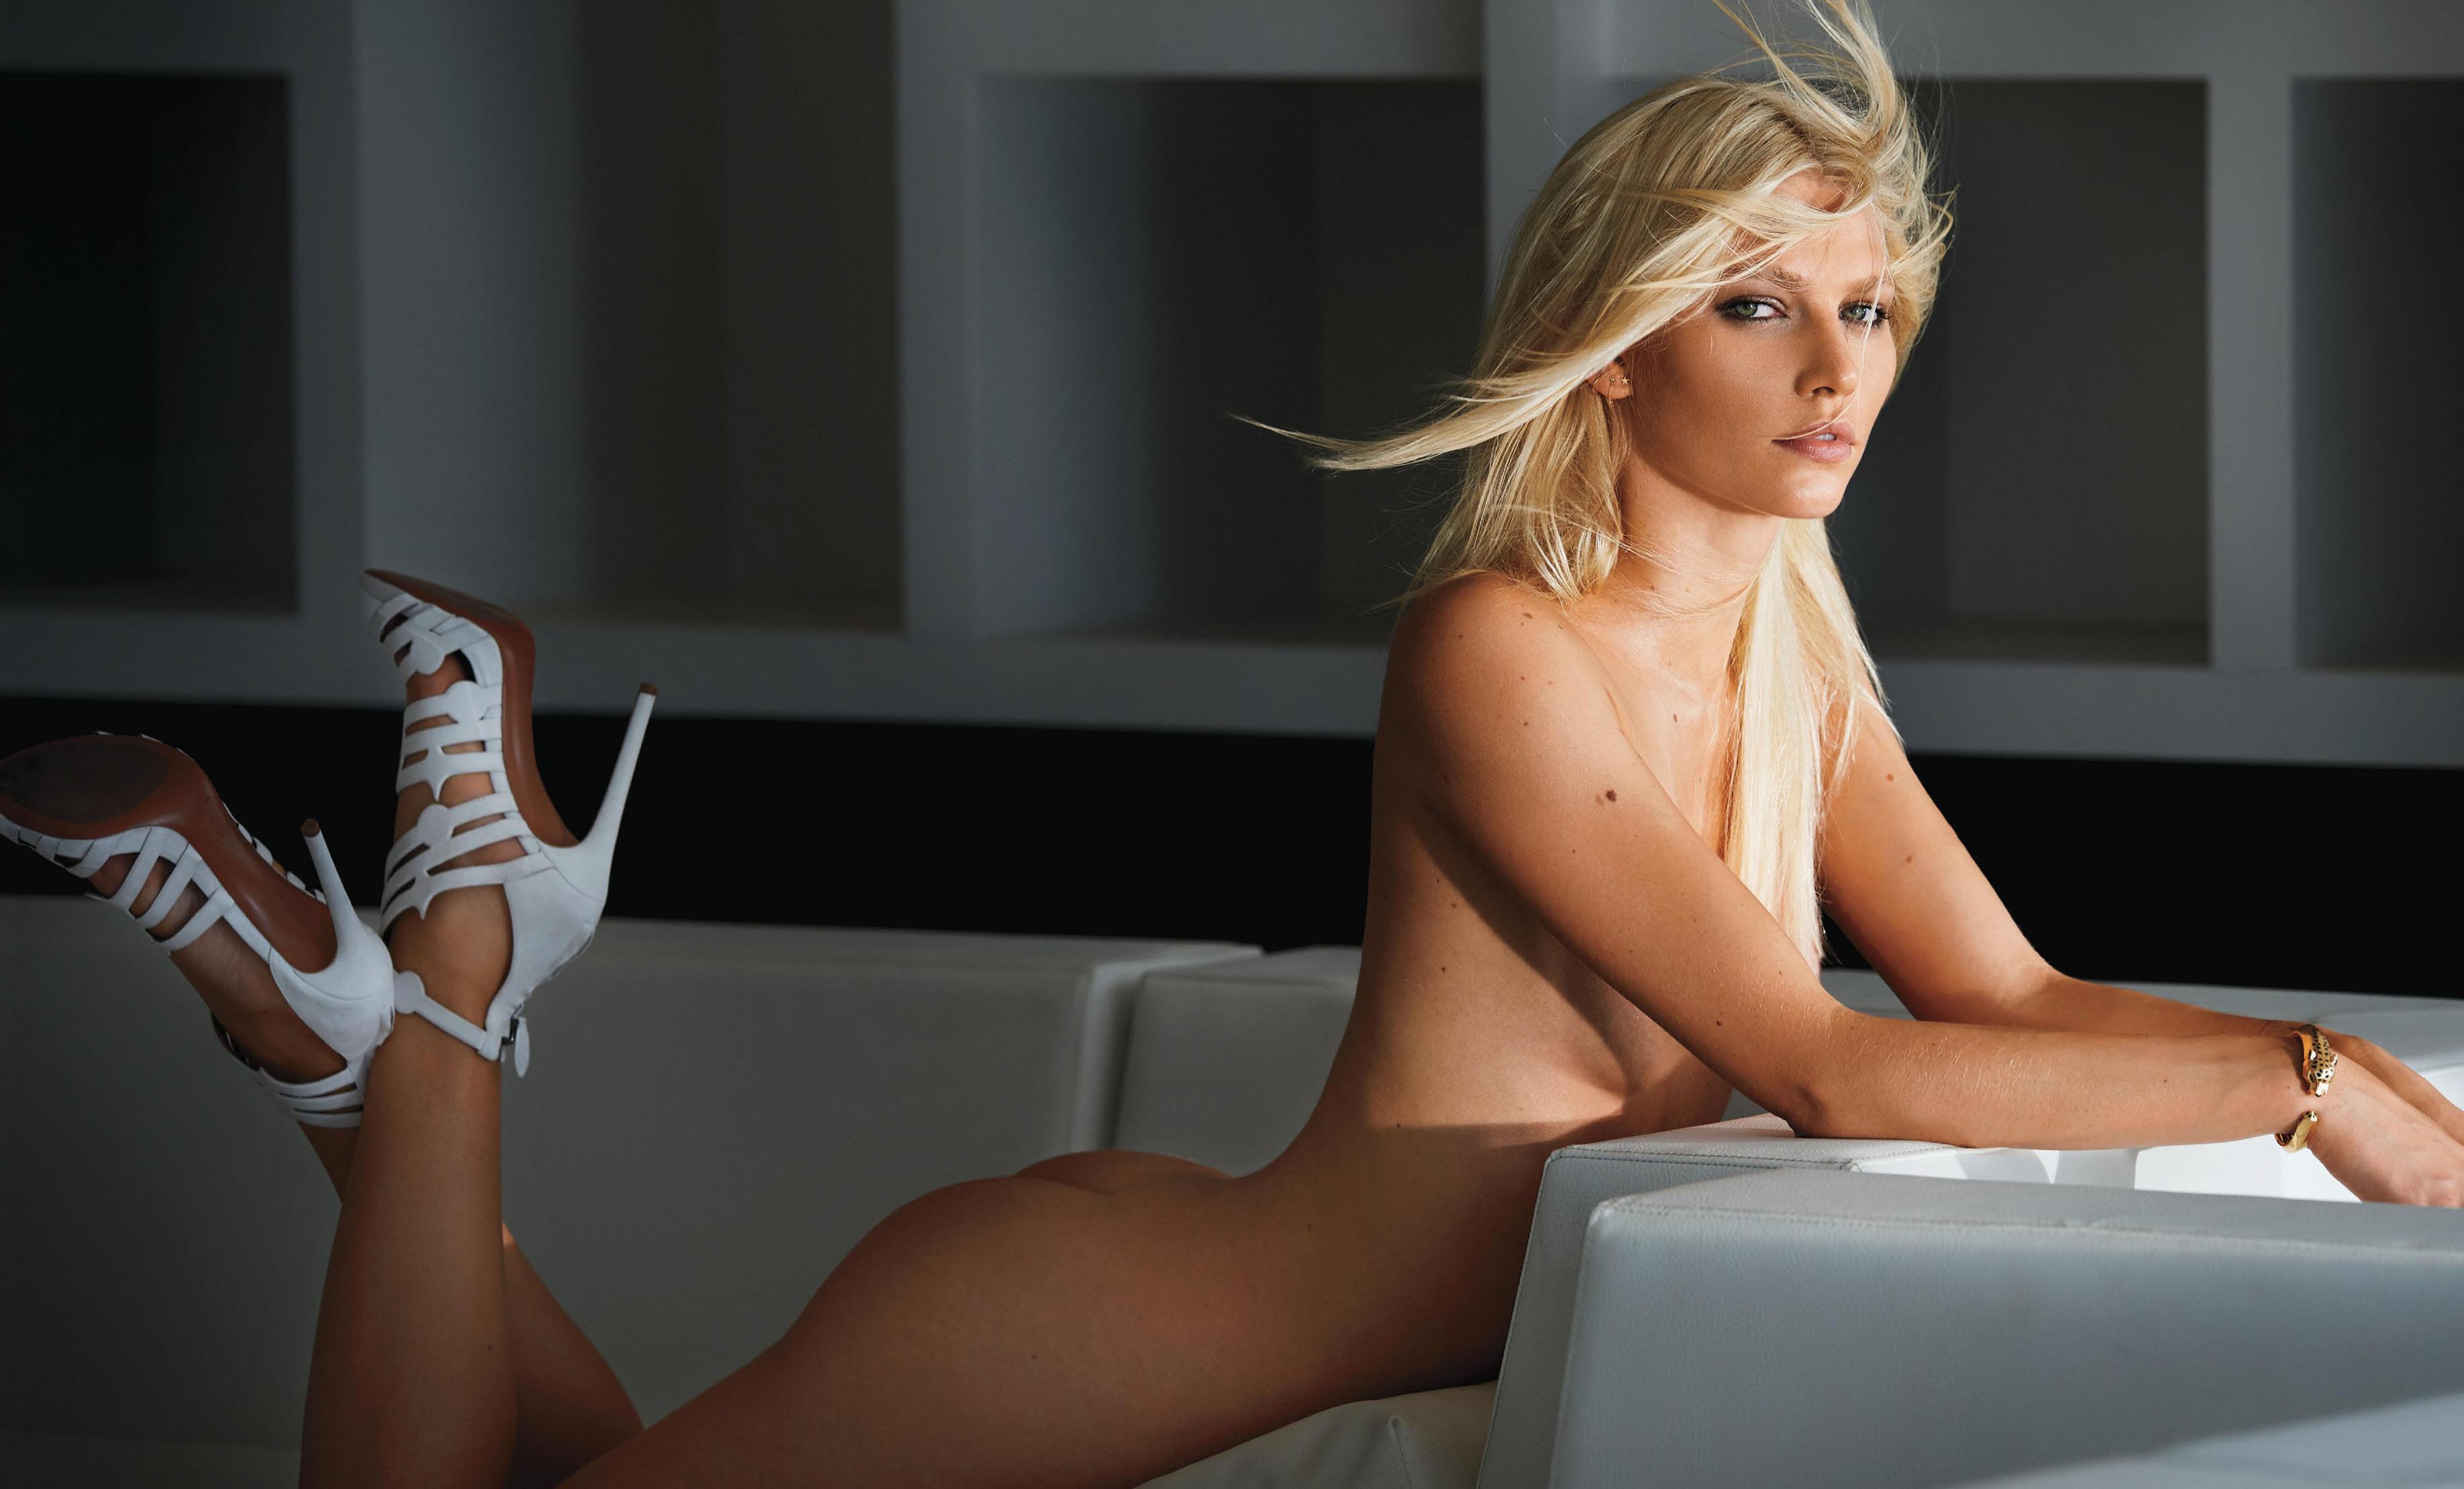 Amy Weber Nude Pictures aline weber porn pic - eporner